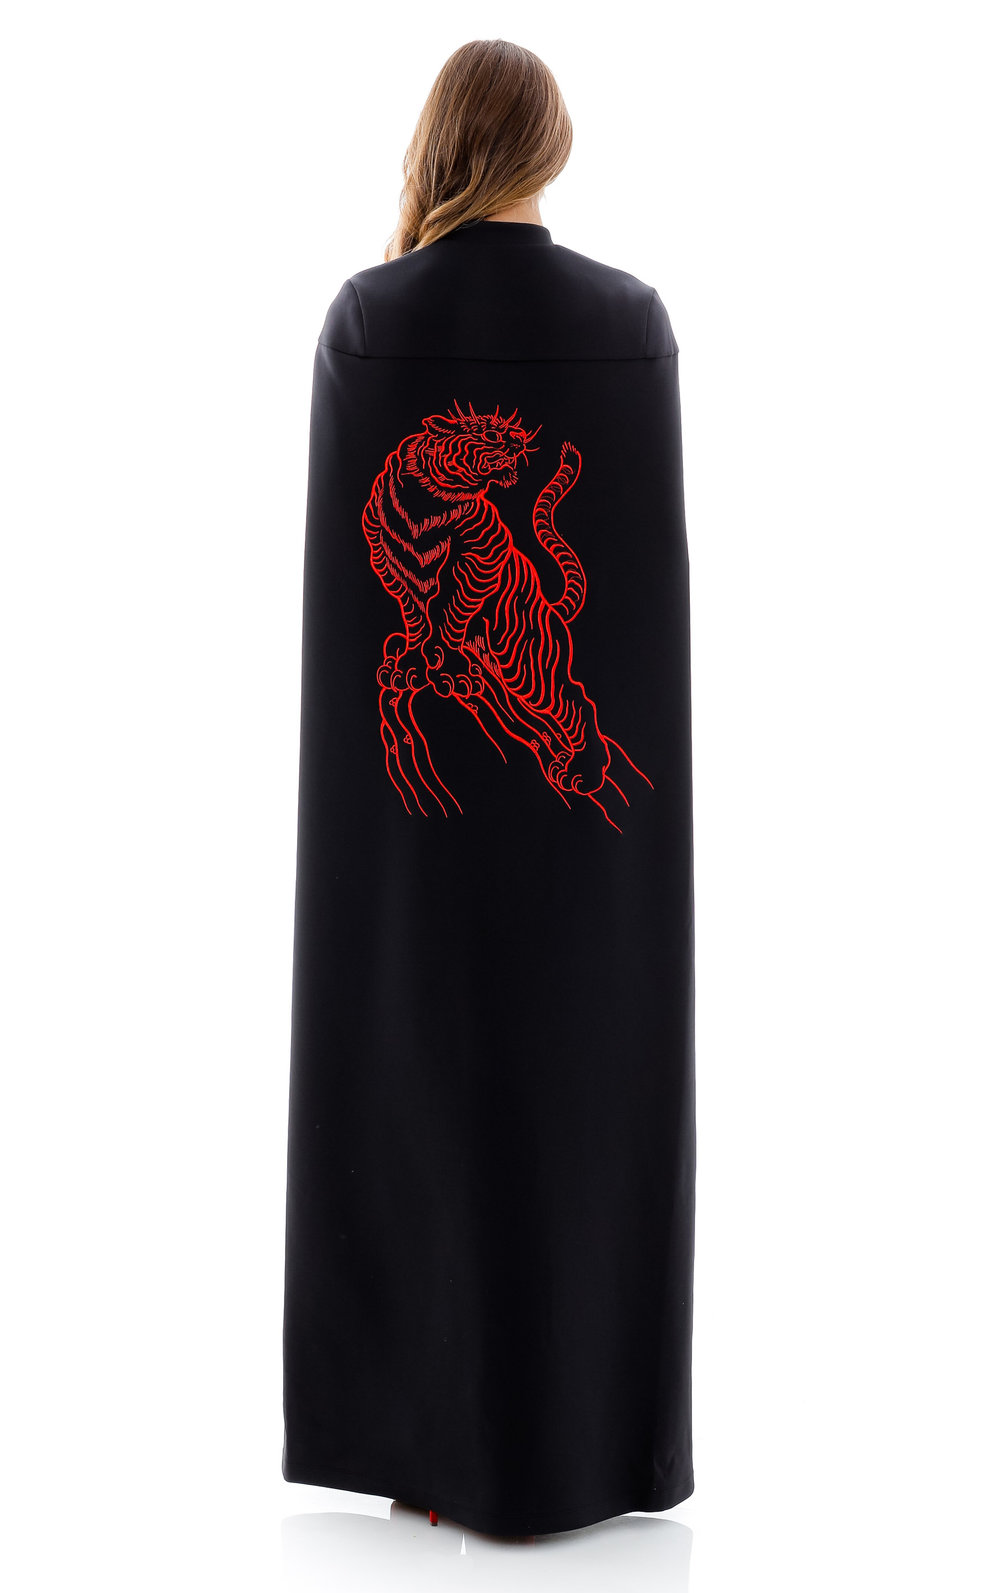 minika-ko-knockout-collection-tiger-cape-black.jpg